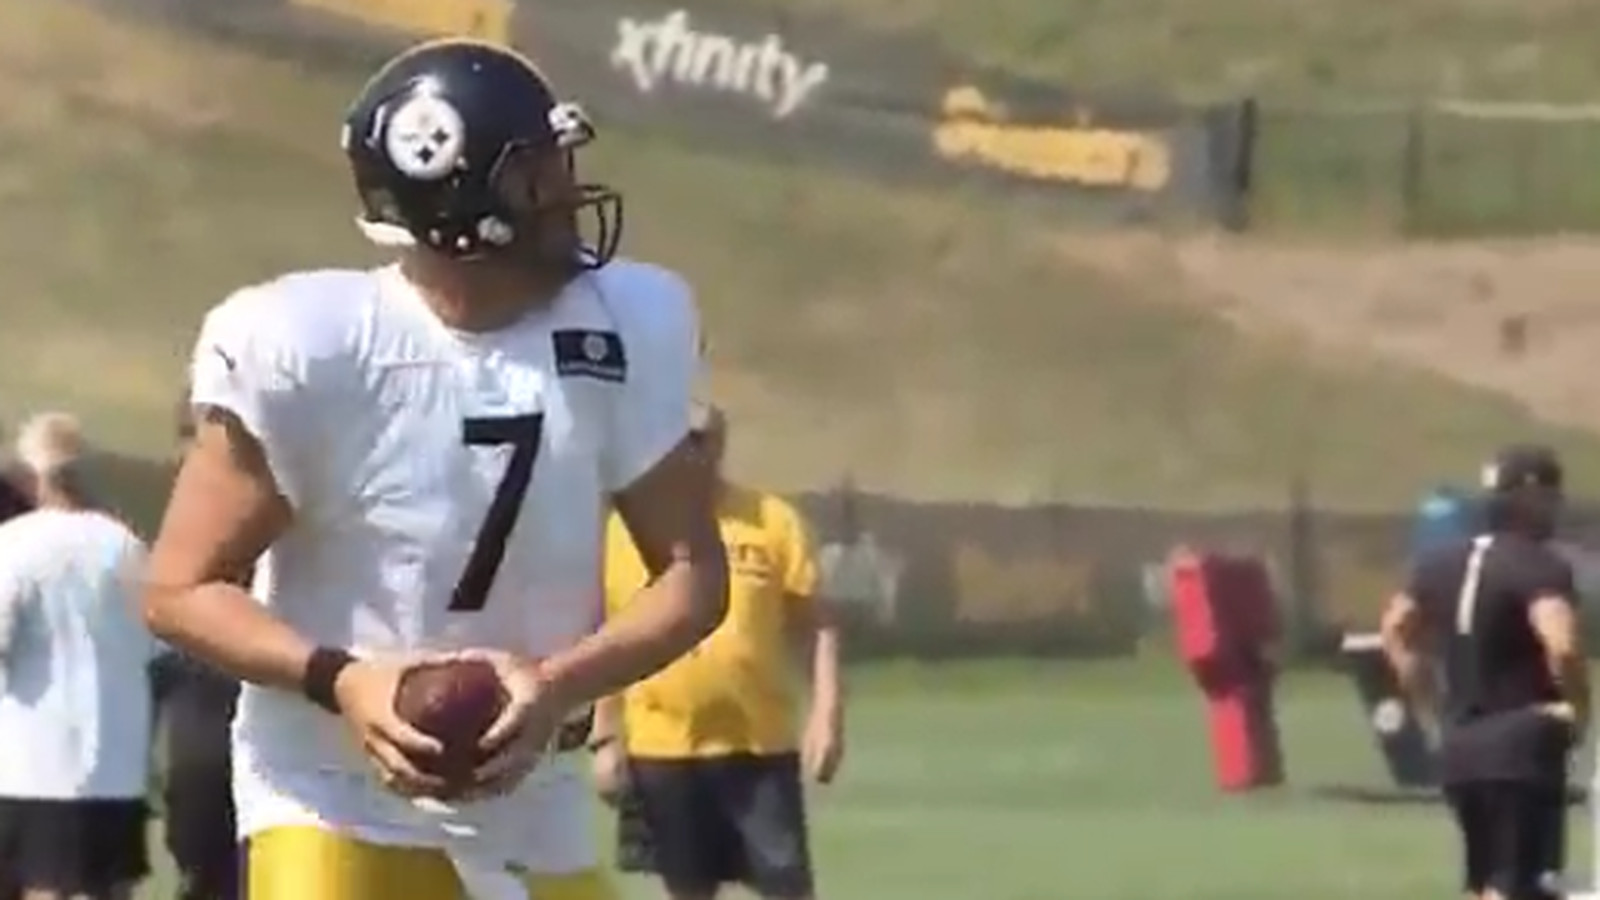 Watch Steelers QB Ben Roethlisberger botching a QB drill at